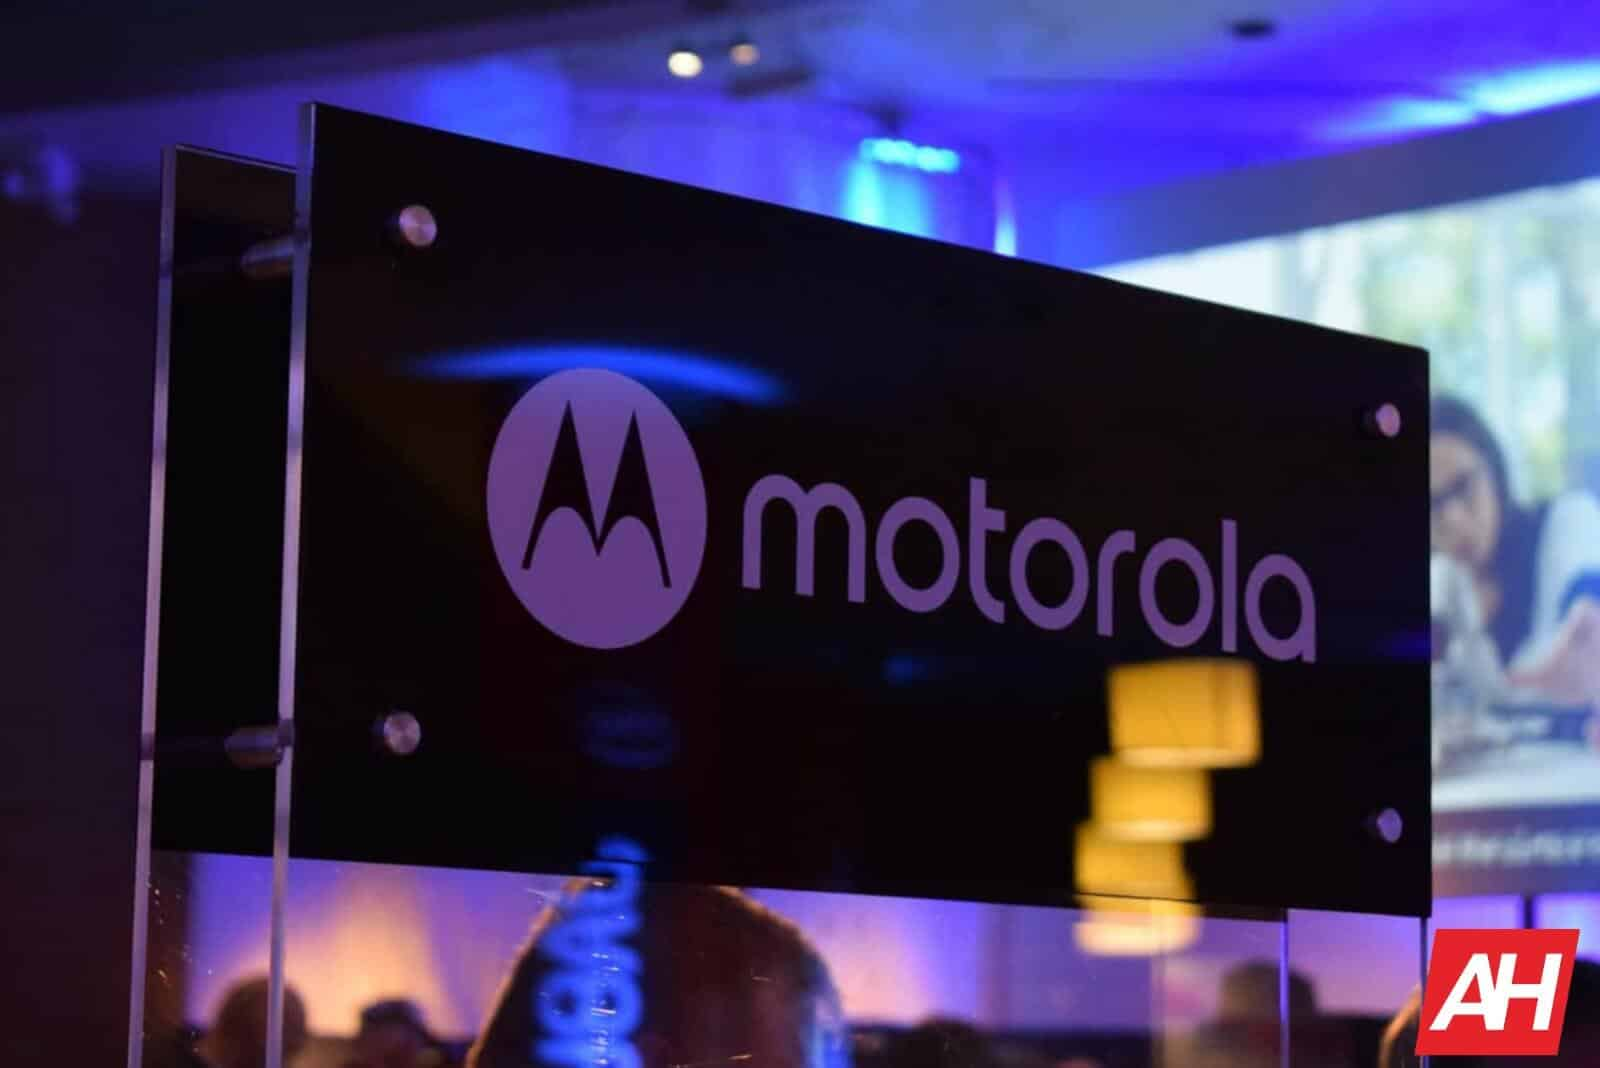 Motorola AH 01 1